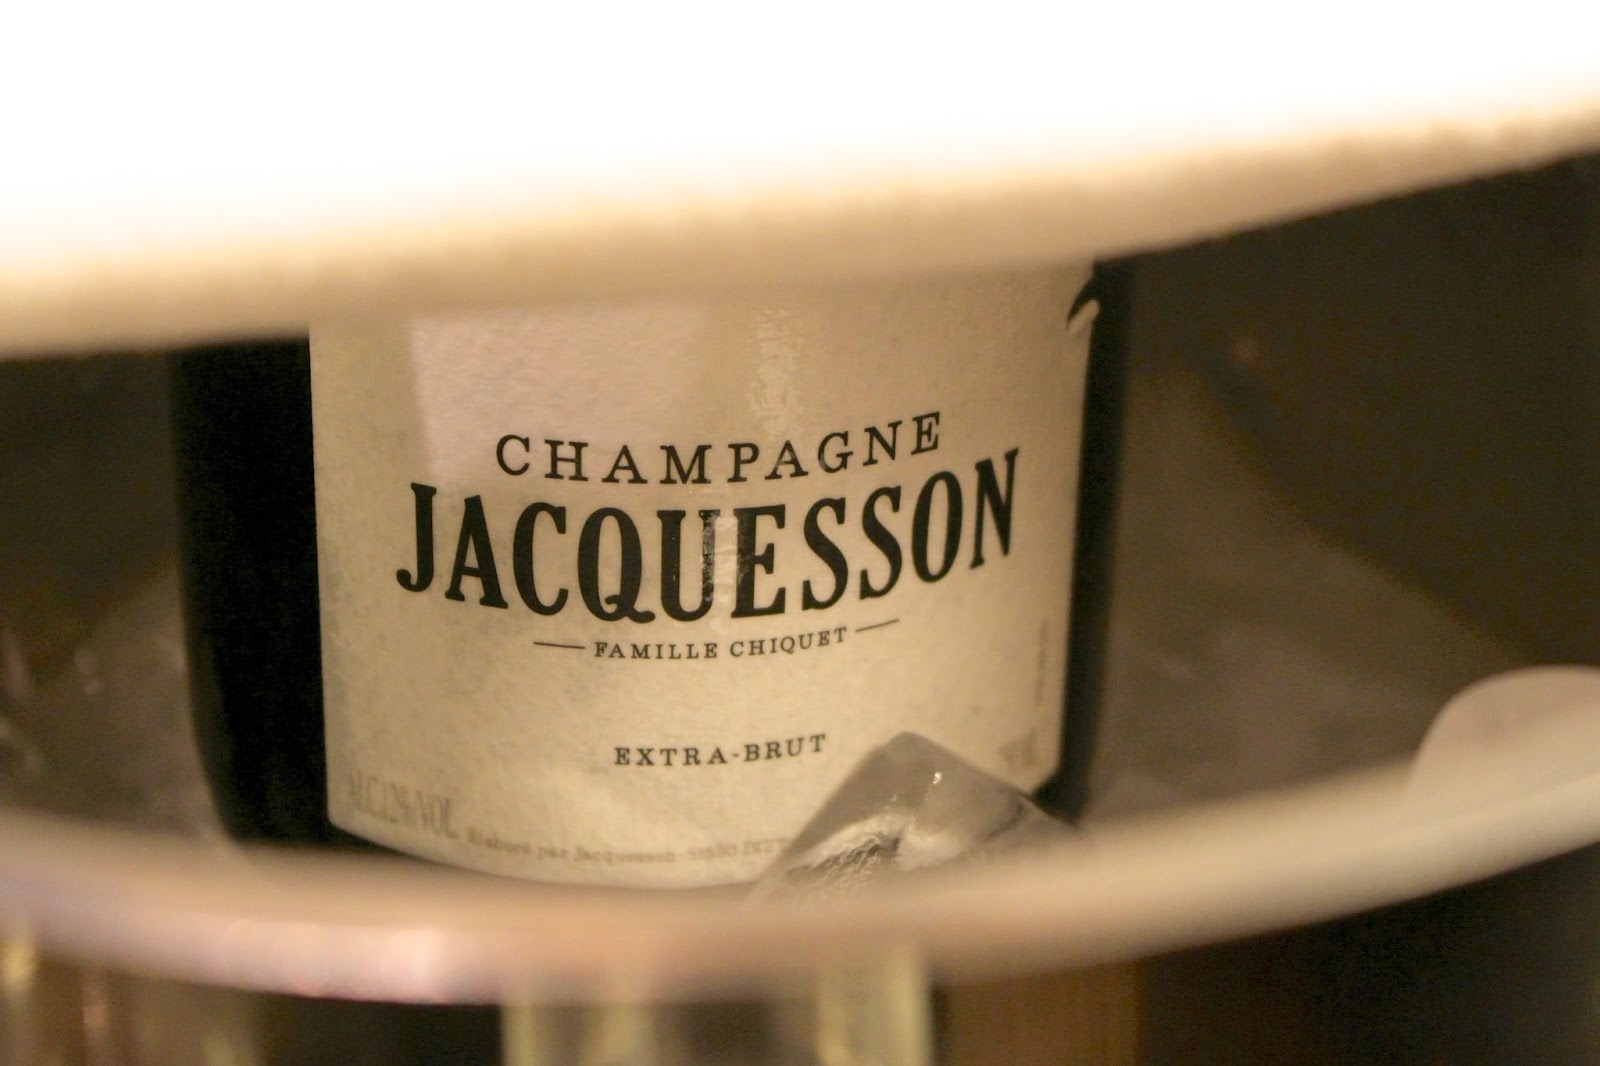 Jacquesson champagne 738